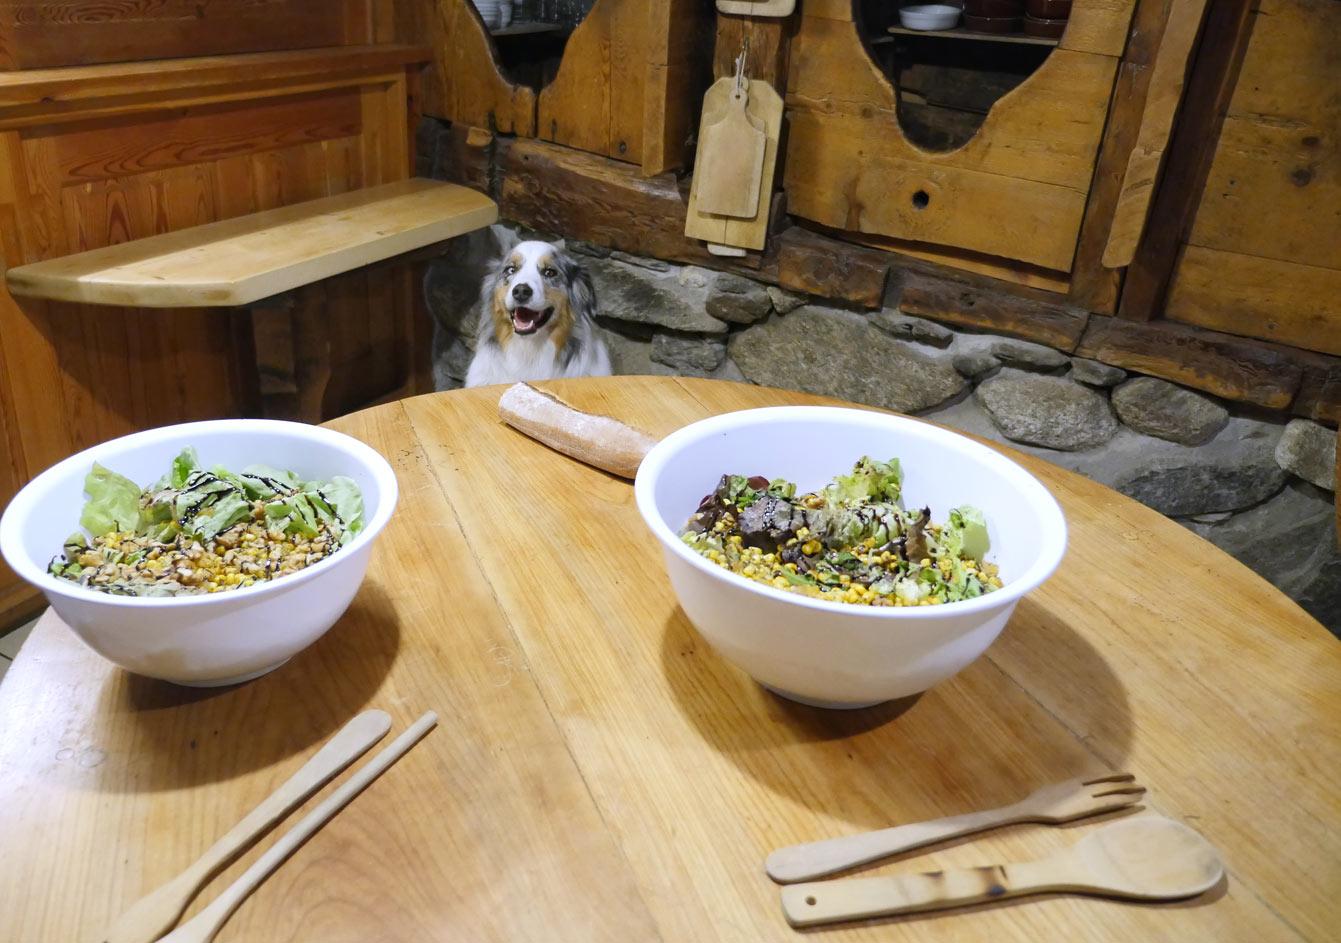 Déjeuner savoyard à l'auberge La Boerne, Chamonix